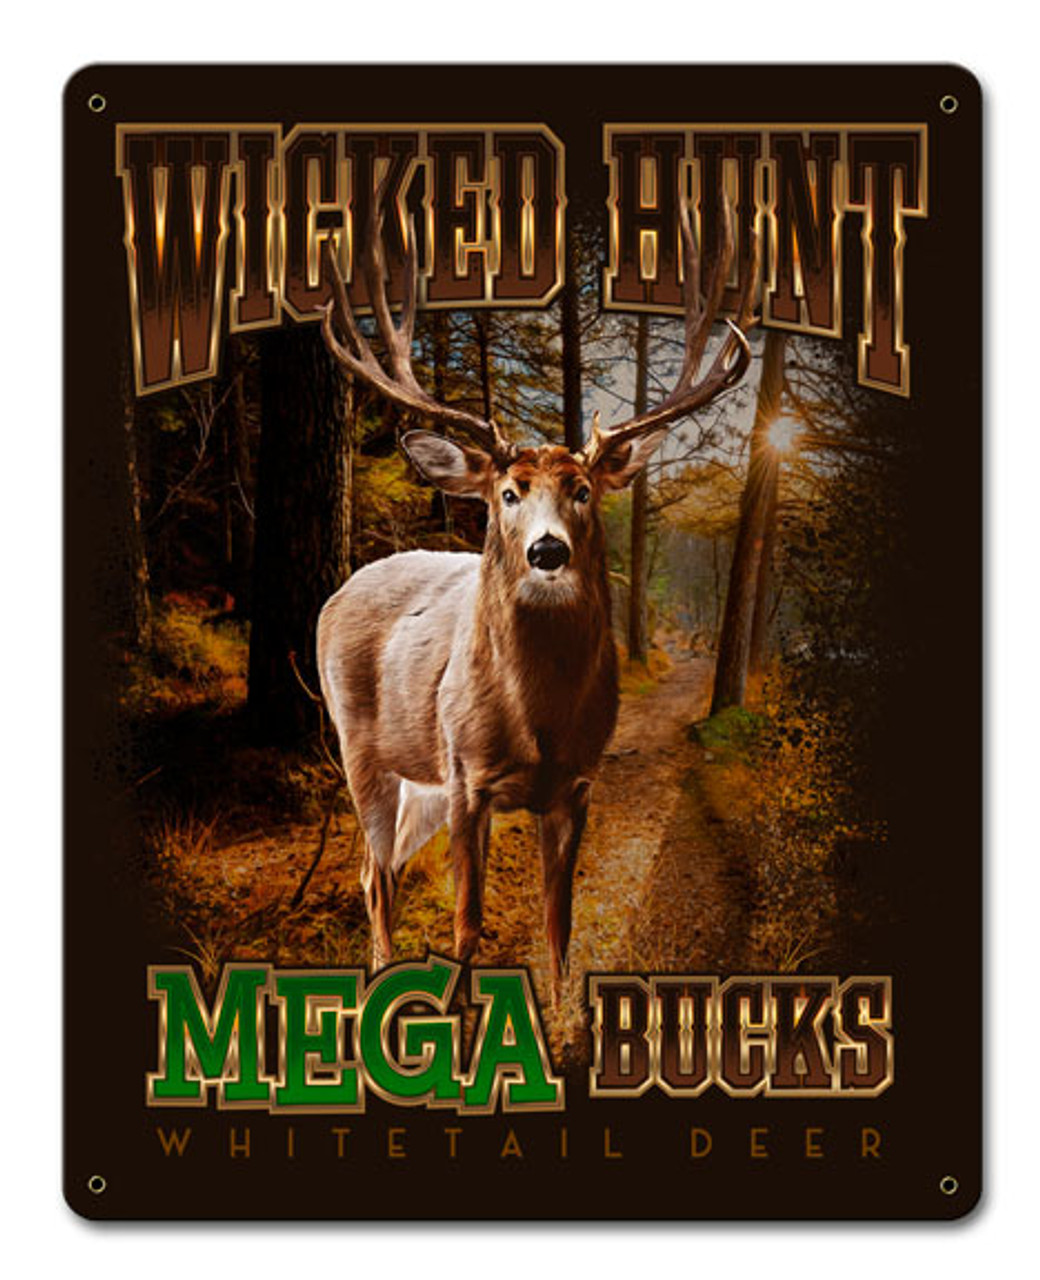 Deer Mega Bucks Metal Sign 12 x 15 Inches